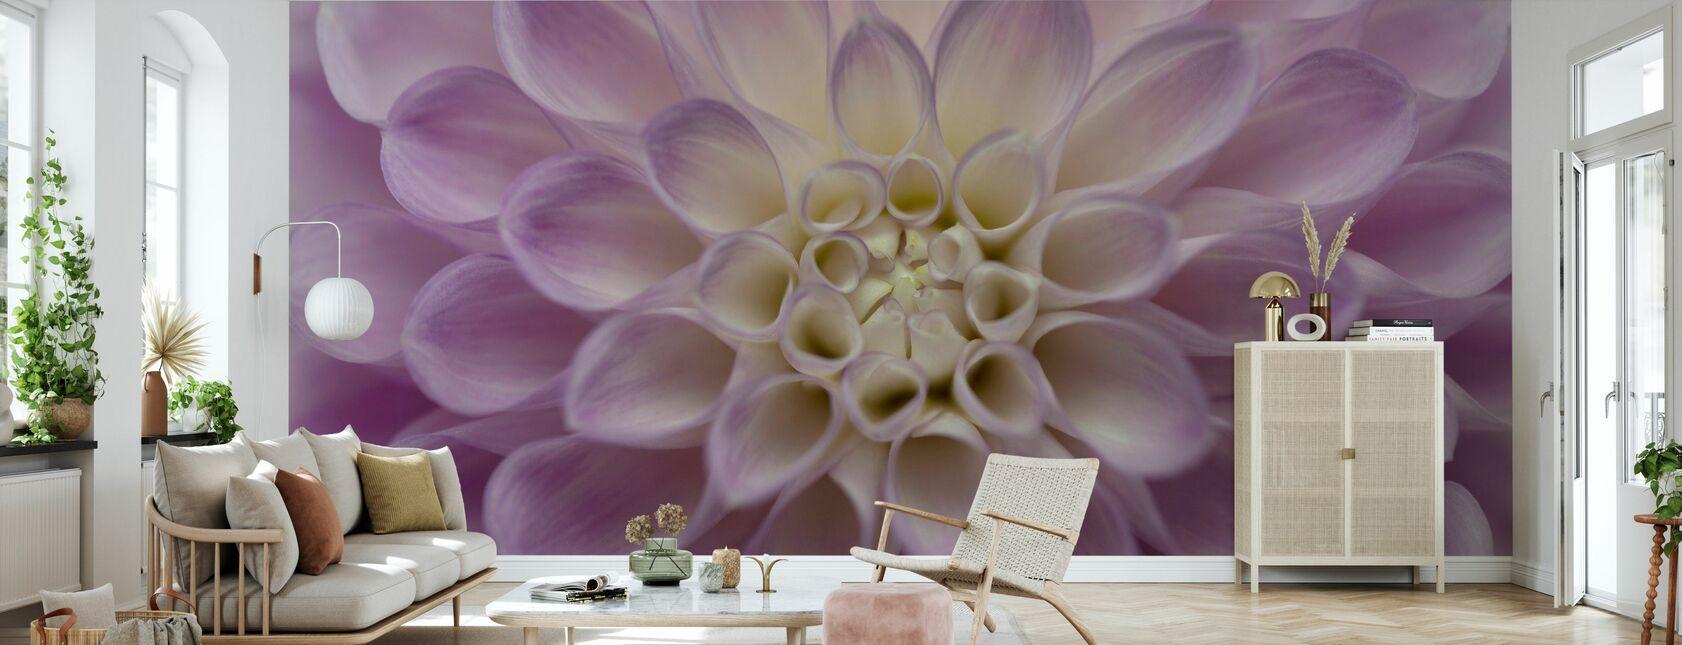 Dahlia - Wallpaper - Living Room